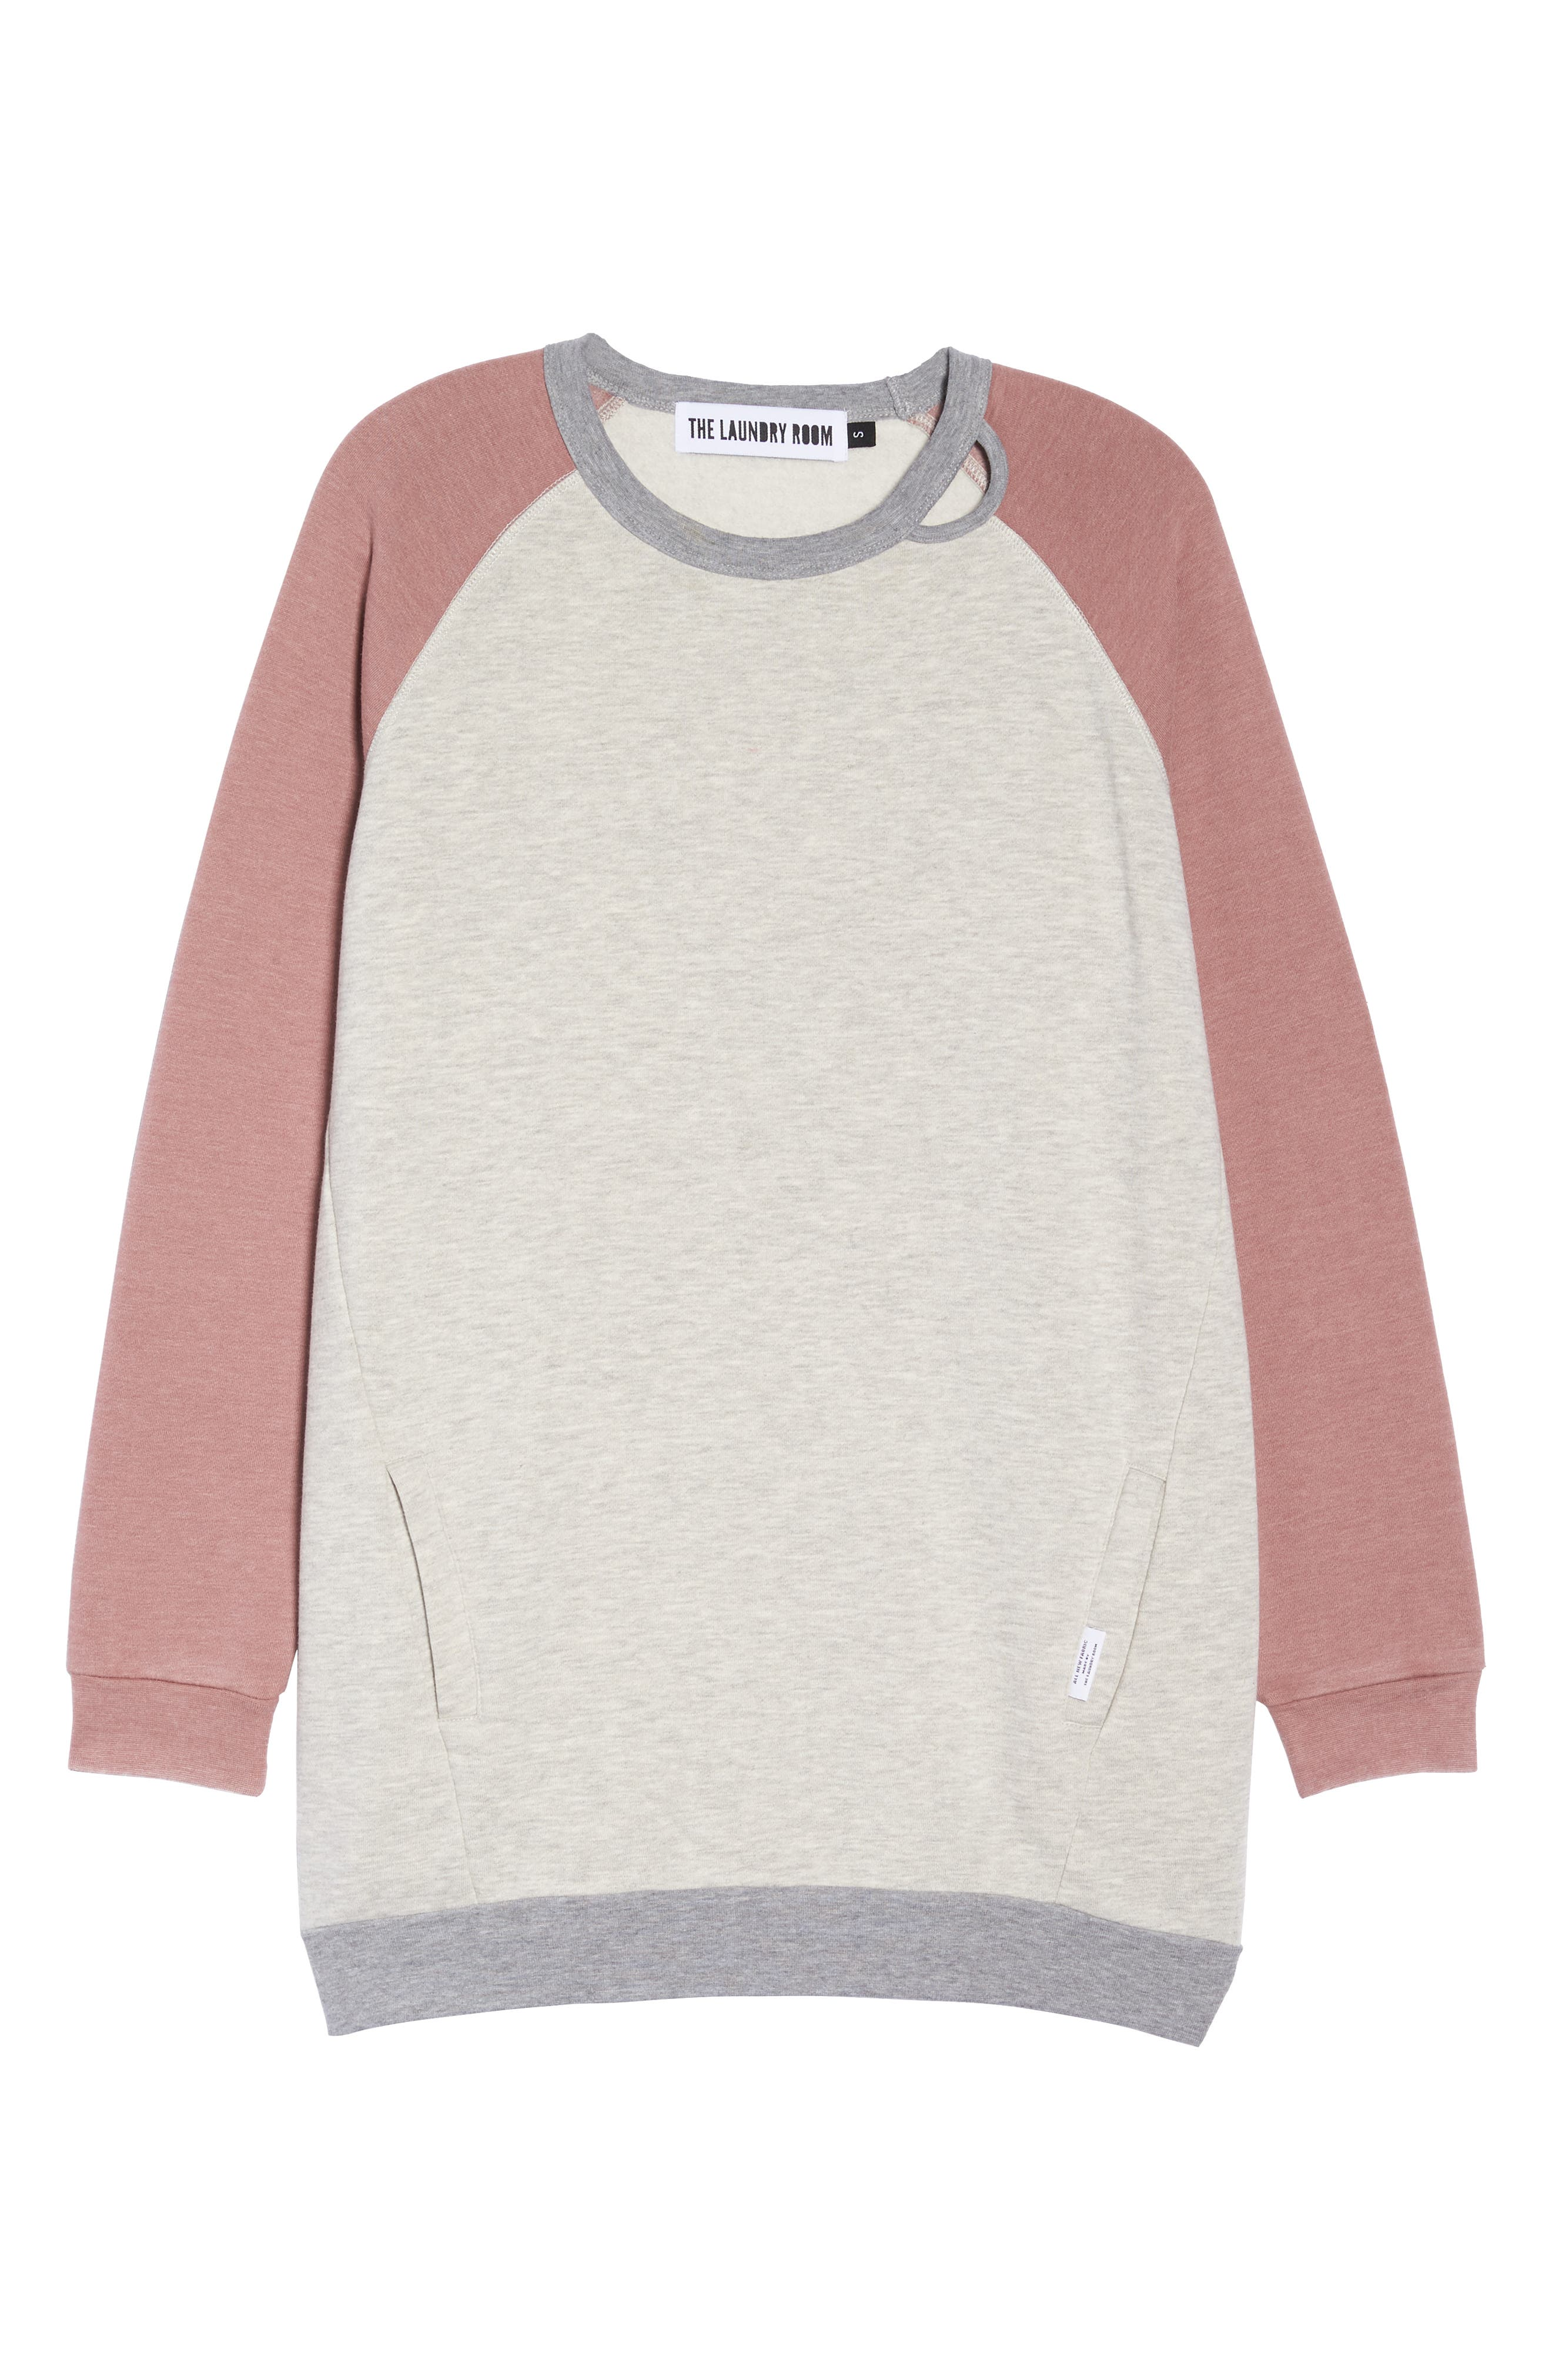 Lounge Sweatshirt Dress,                             Alternate thumbnail 6, color,                             PEBBLE HEATHER / MAUVE